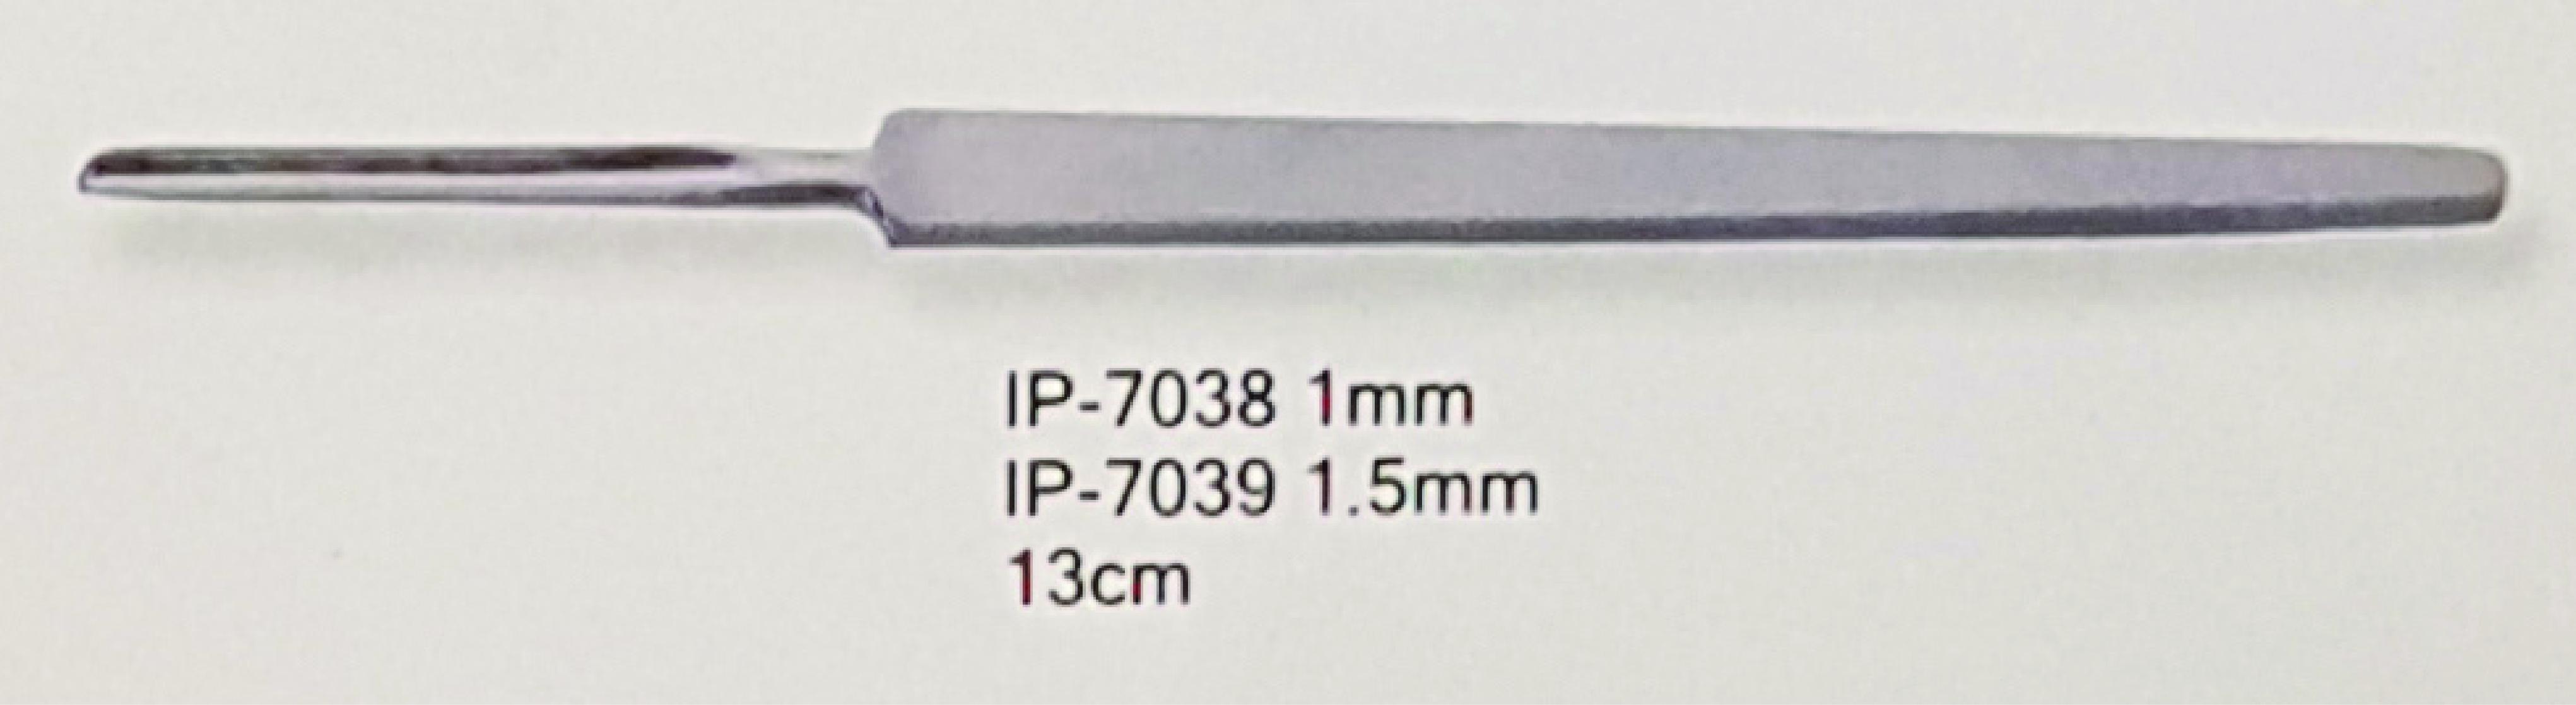 IP-7038 - 39